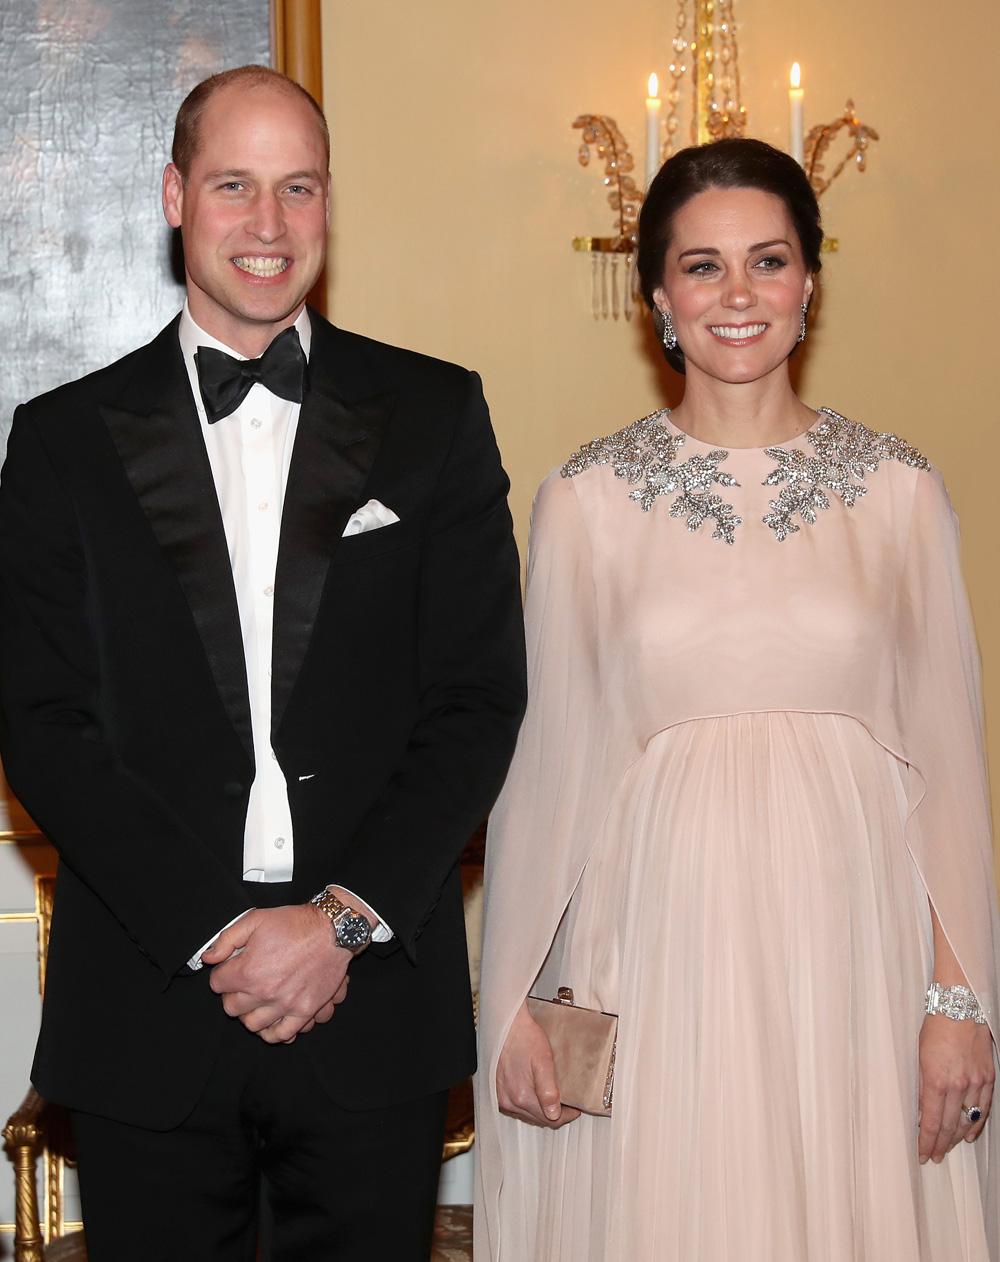 Не герцогиня, а принцесса: сказочный наряд Кейт Миддлтон на приеме в Осло